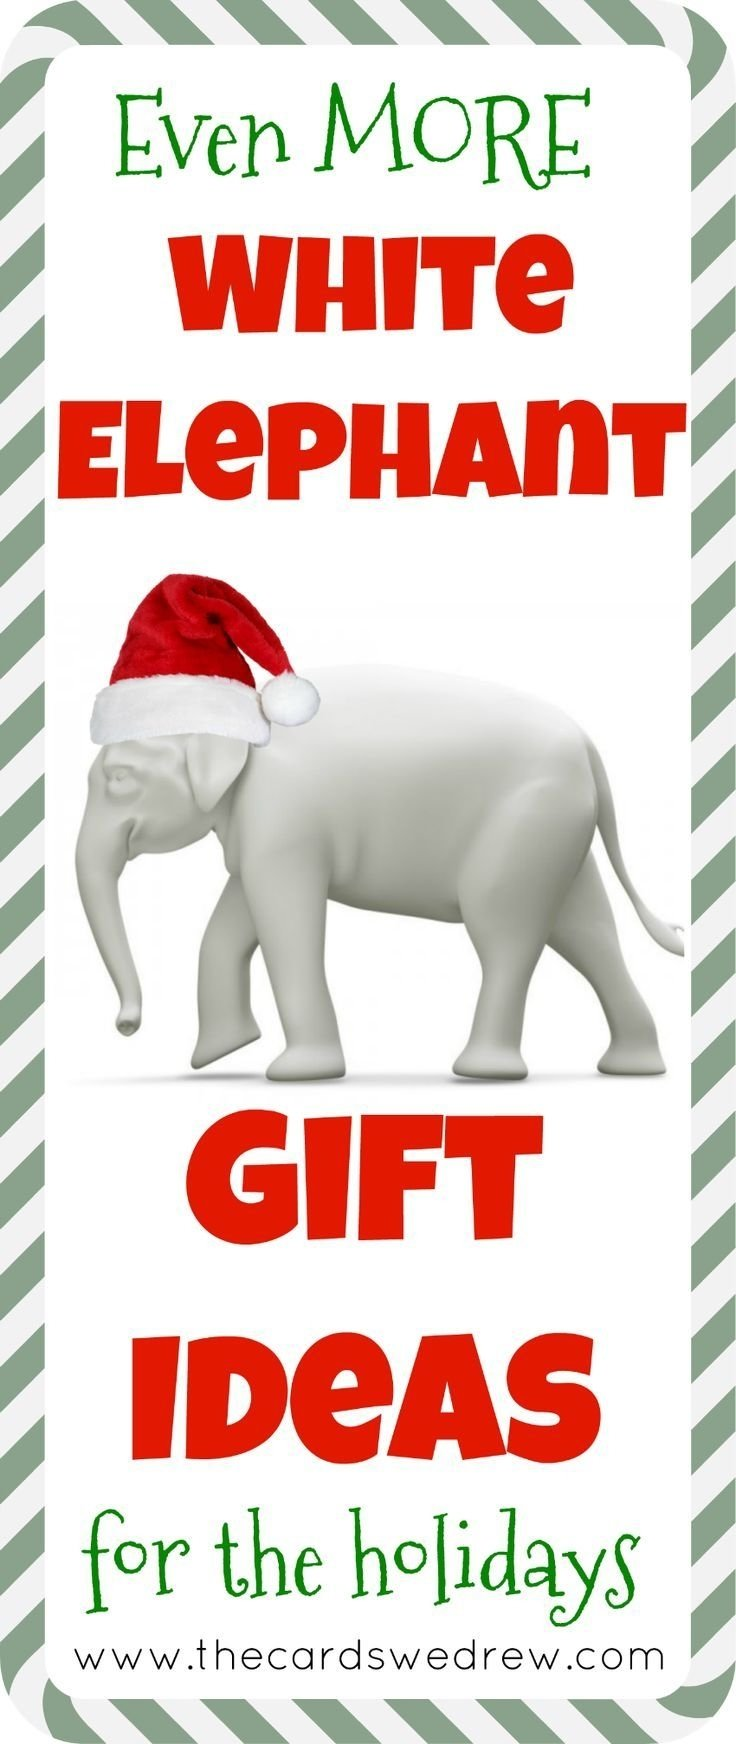 10 Famous Christmas White Elephant Gift Ideas 395 best gift ideas images on pinterest christmas presents 5 2021